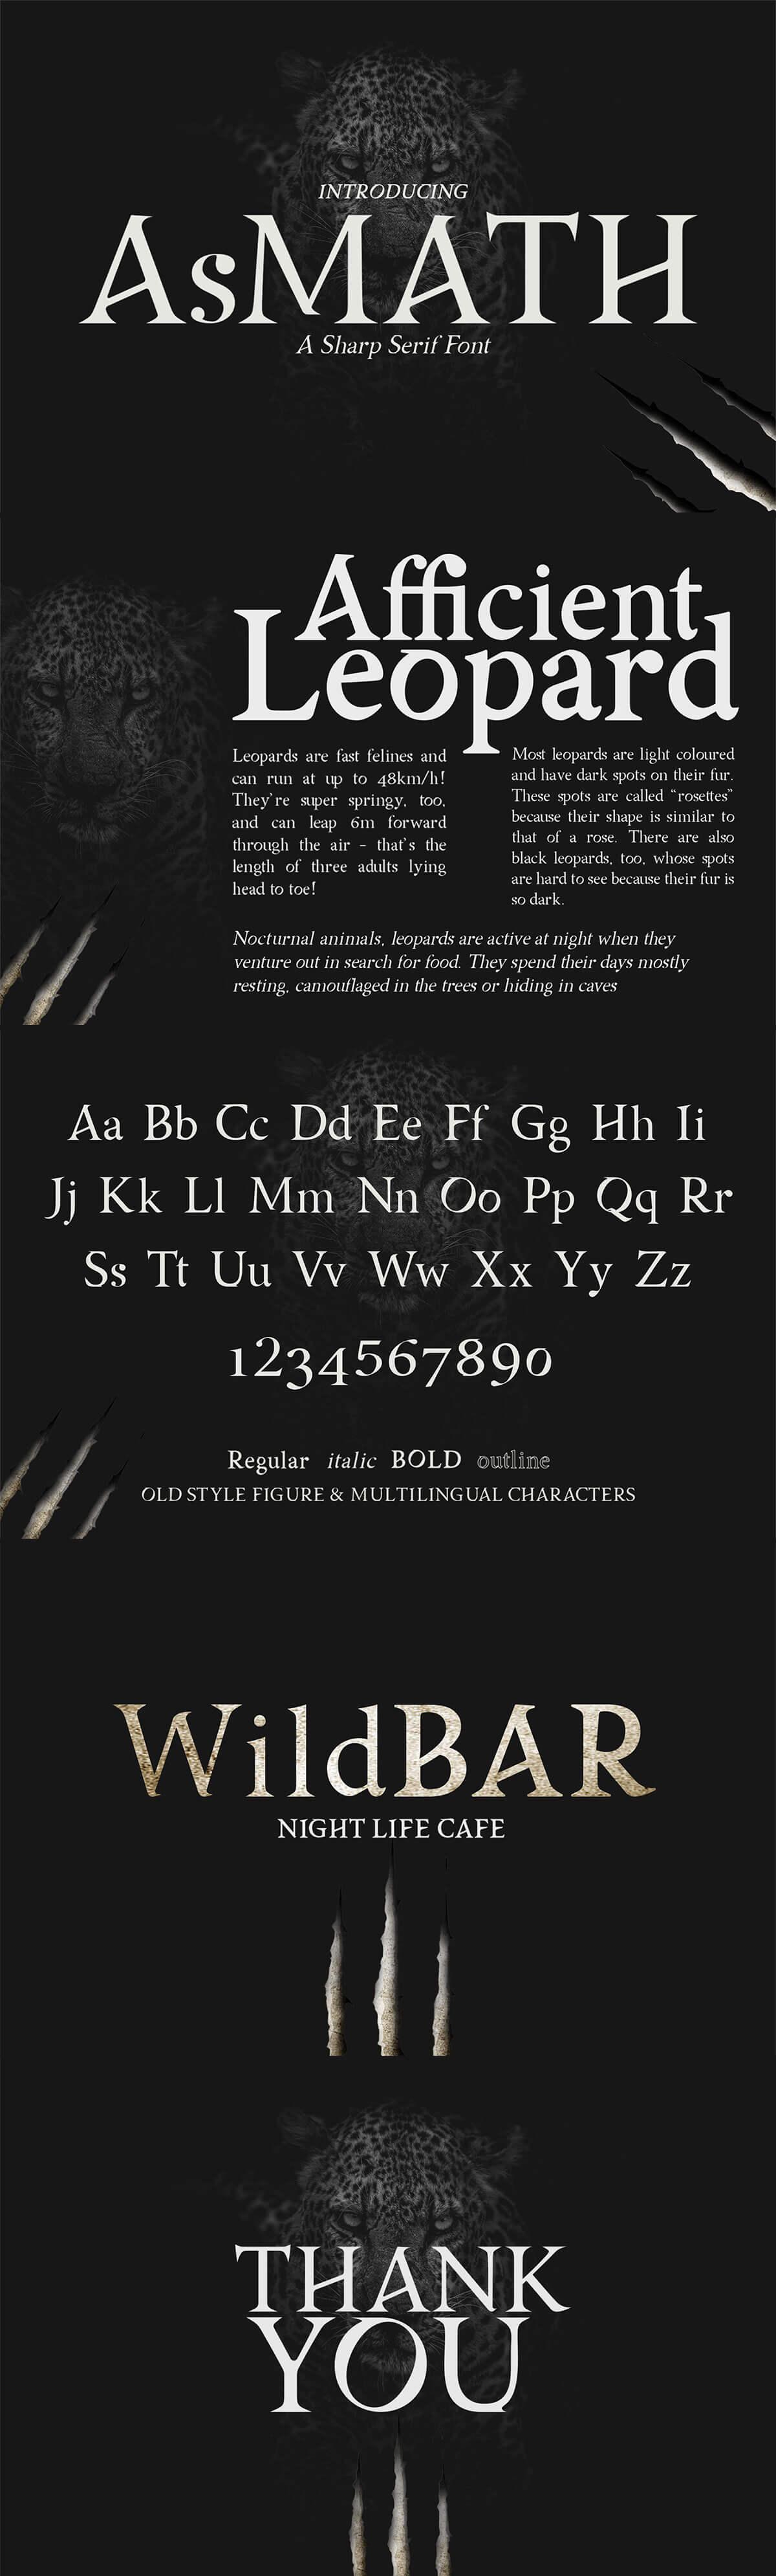 Free Asmath Serif Font